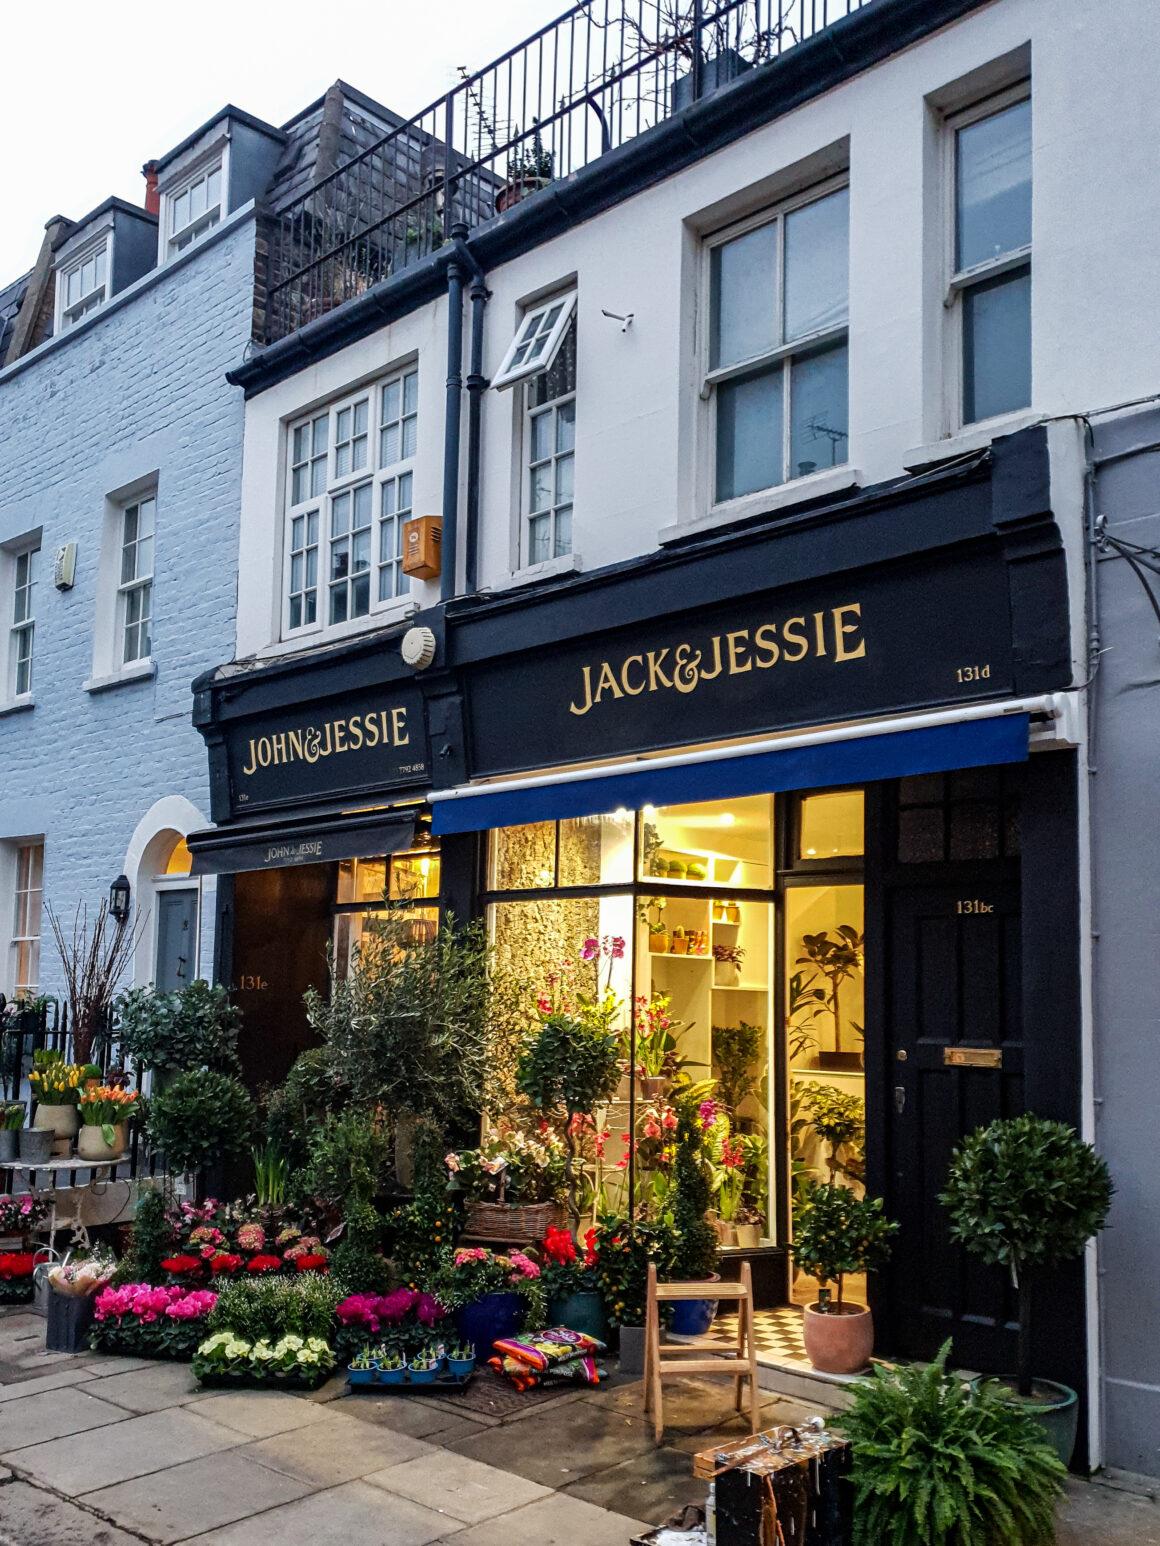 Exploring Kensington - John and Jessie Kensington - Hotels in Kensington